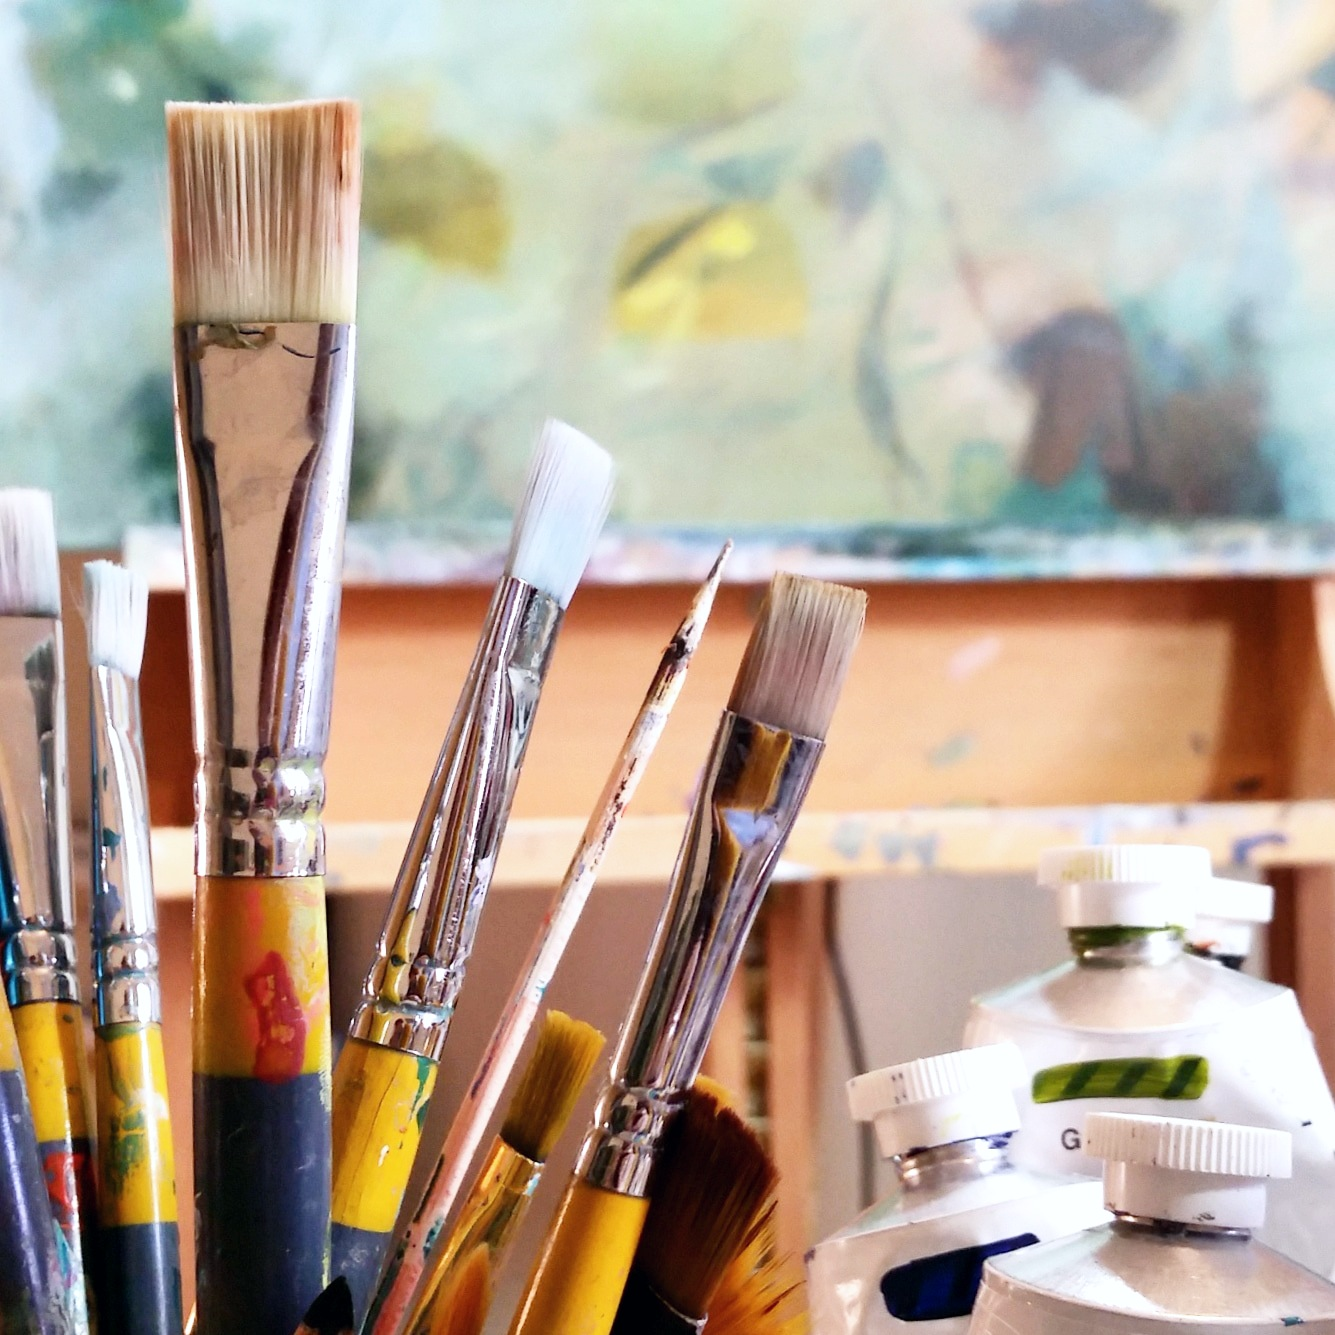 Planning an Art Space. Tips!